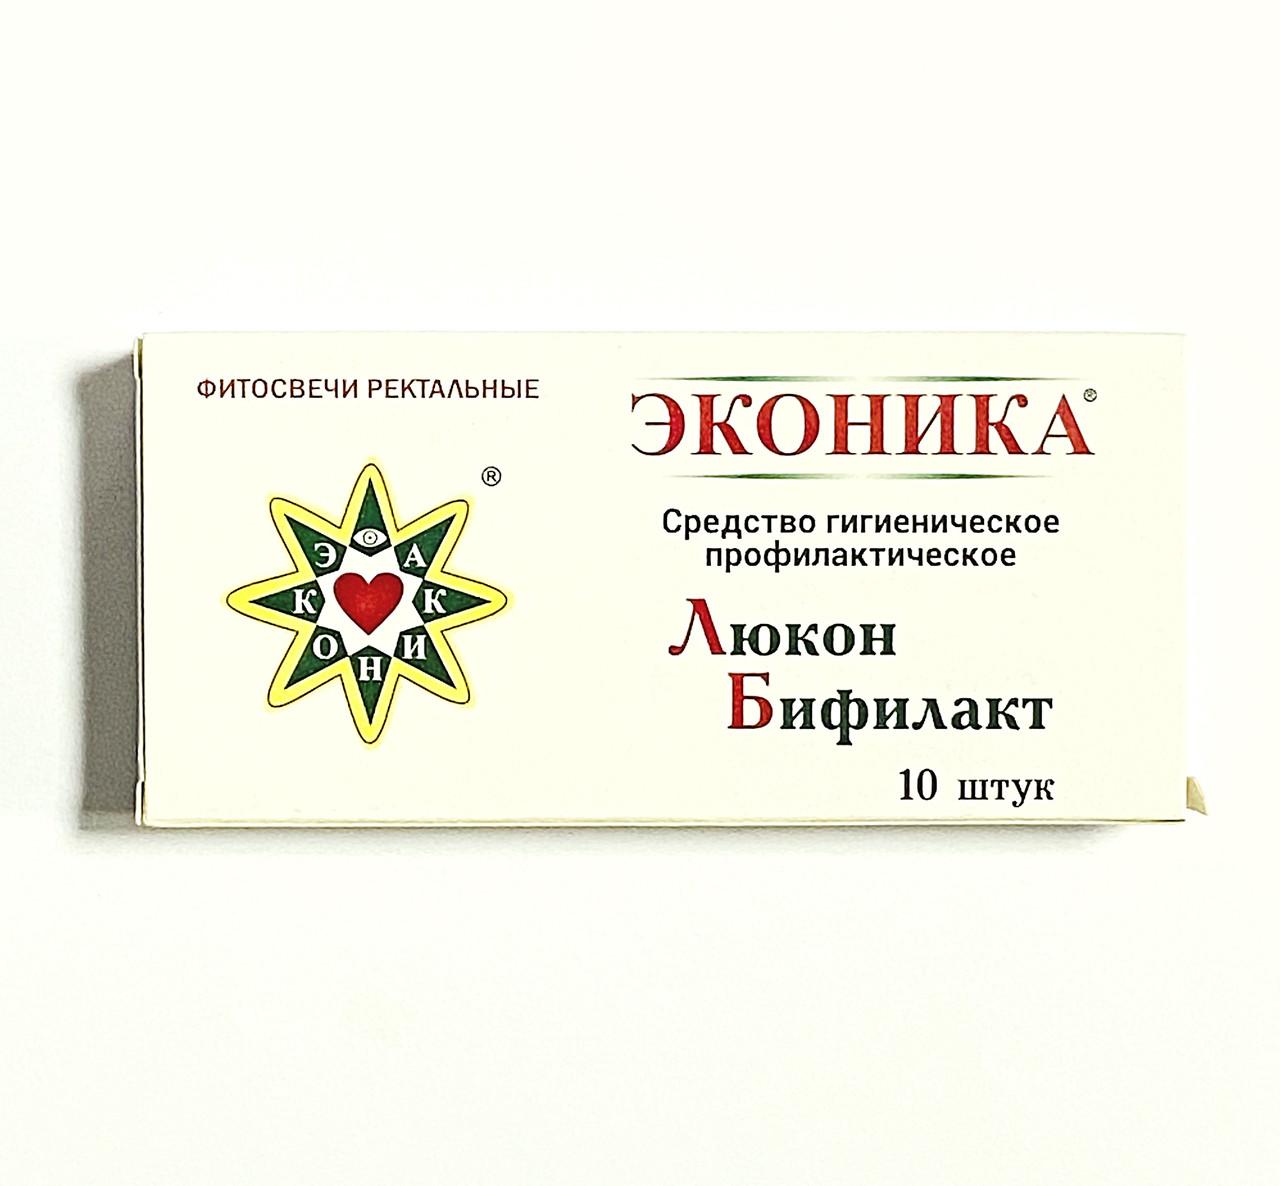 Люкон БИФИЛАКТ фитосвечи №10 Эконика